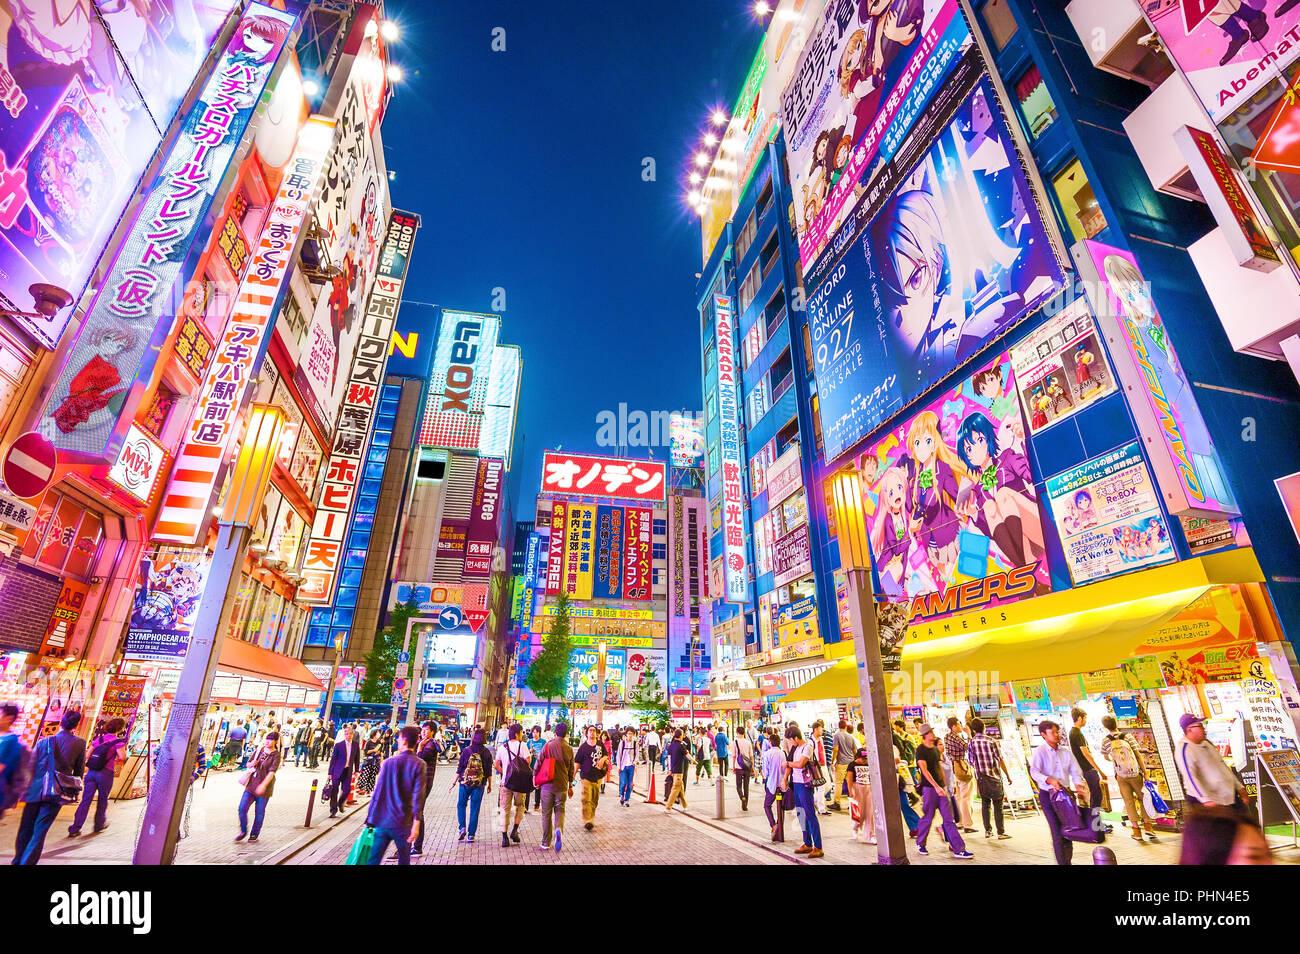 Akihabara Tokyo Electric Town Japan - Stock Image